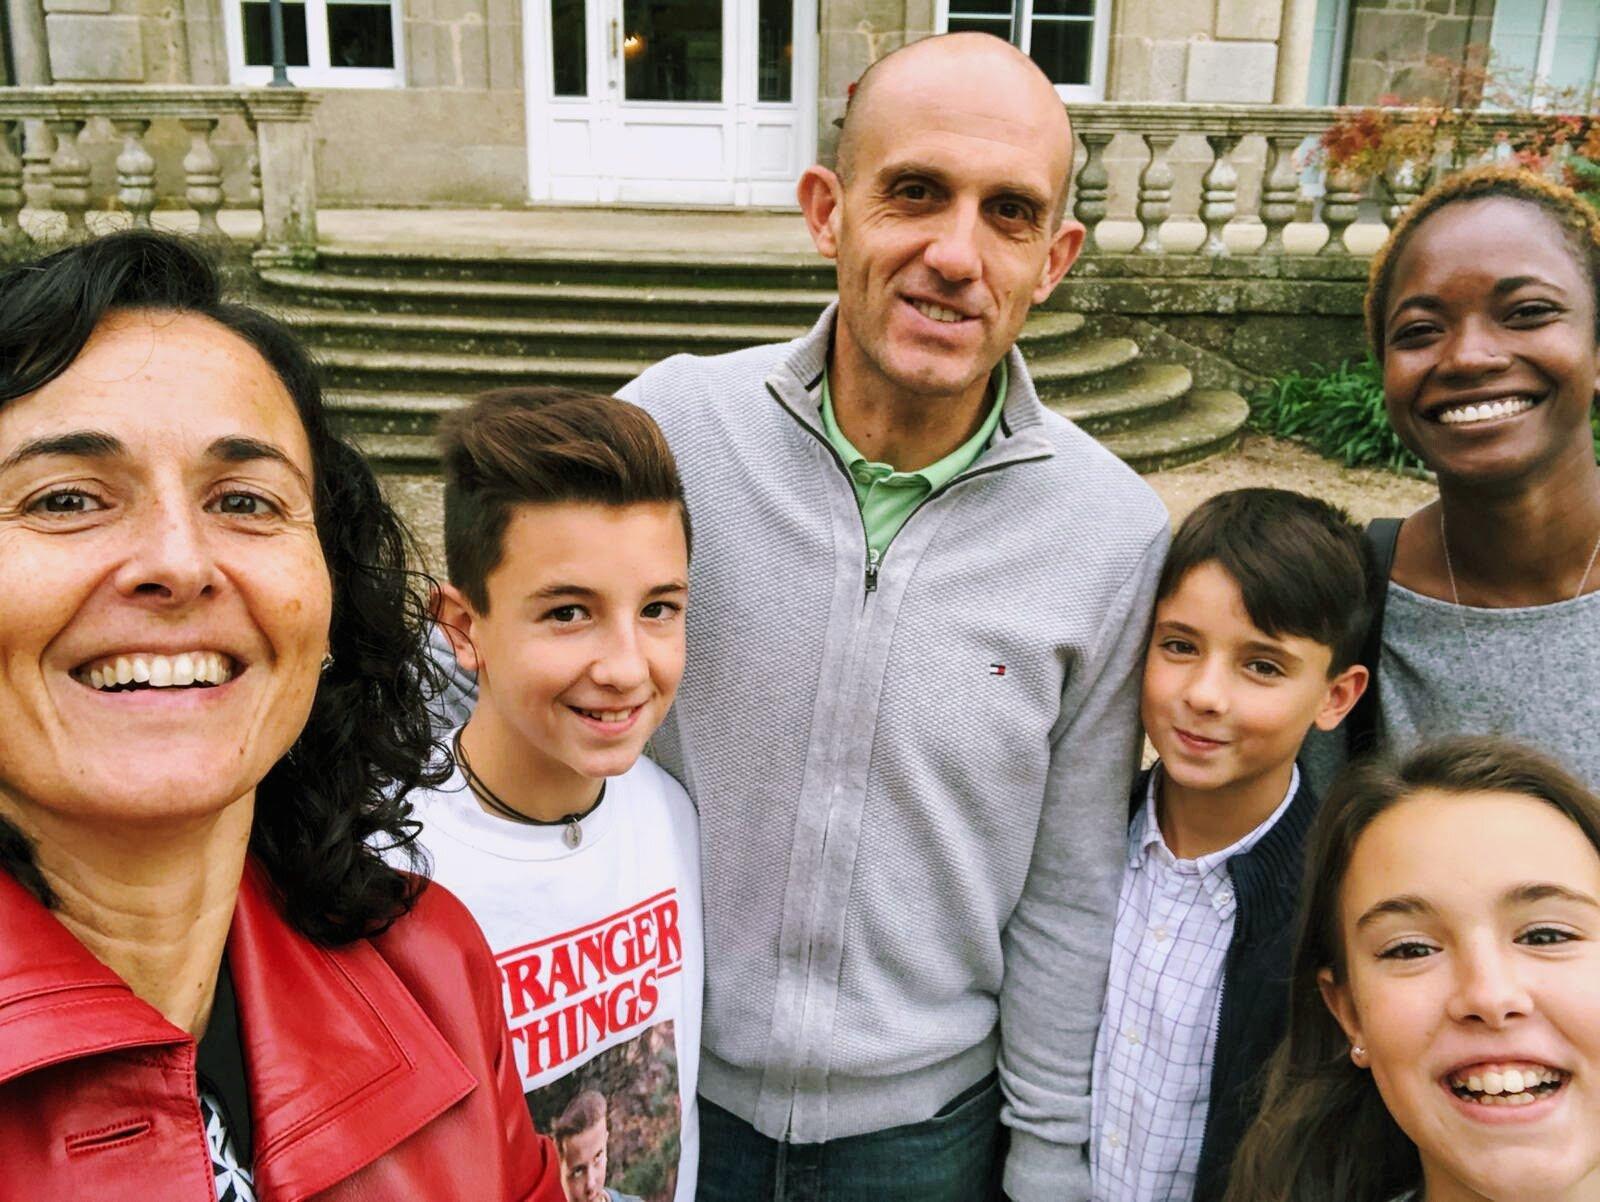 Monica, Fernán, Fer, Martino and María (L-R) in Mondariz